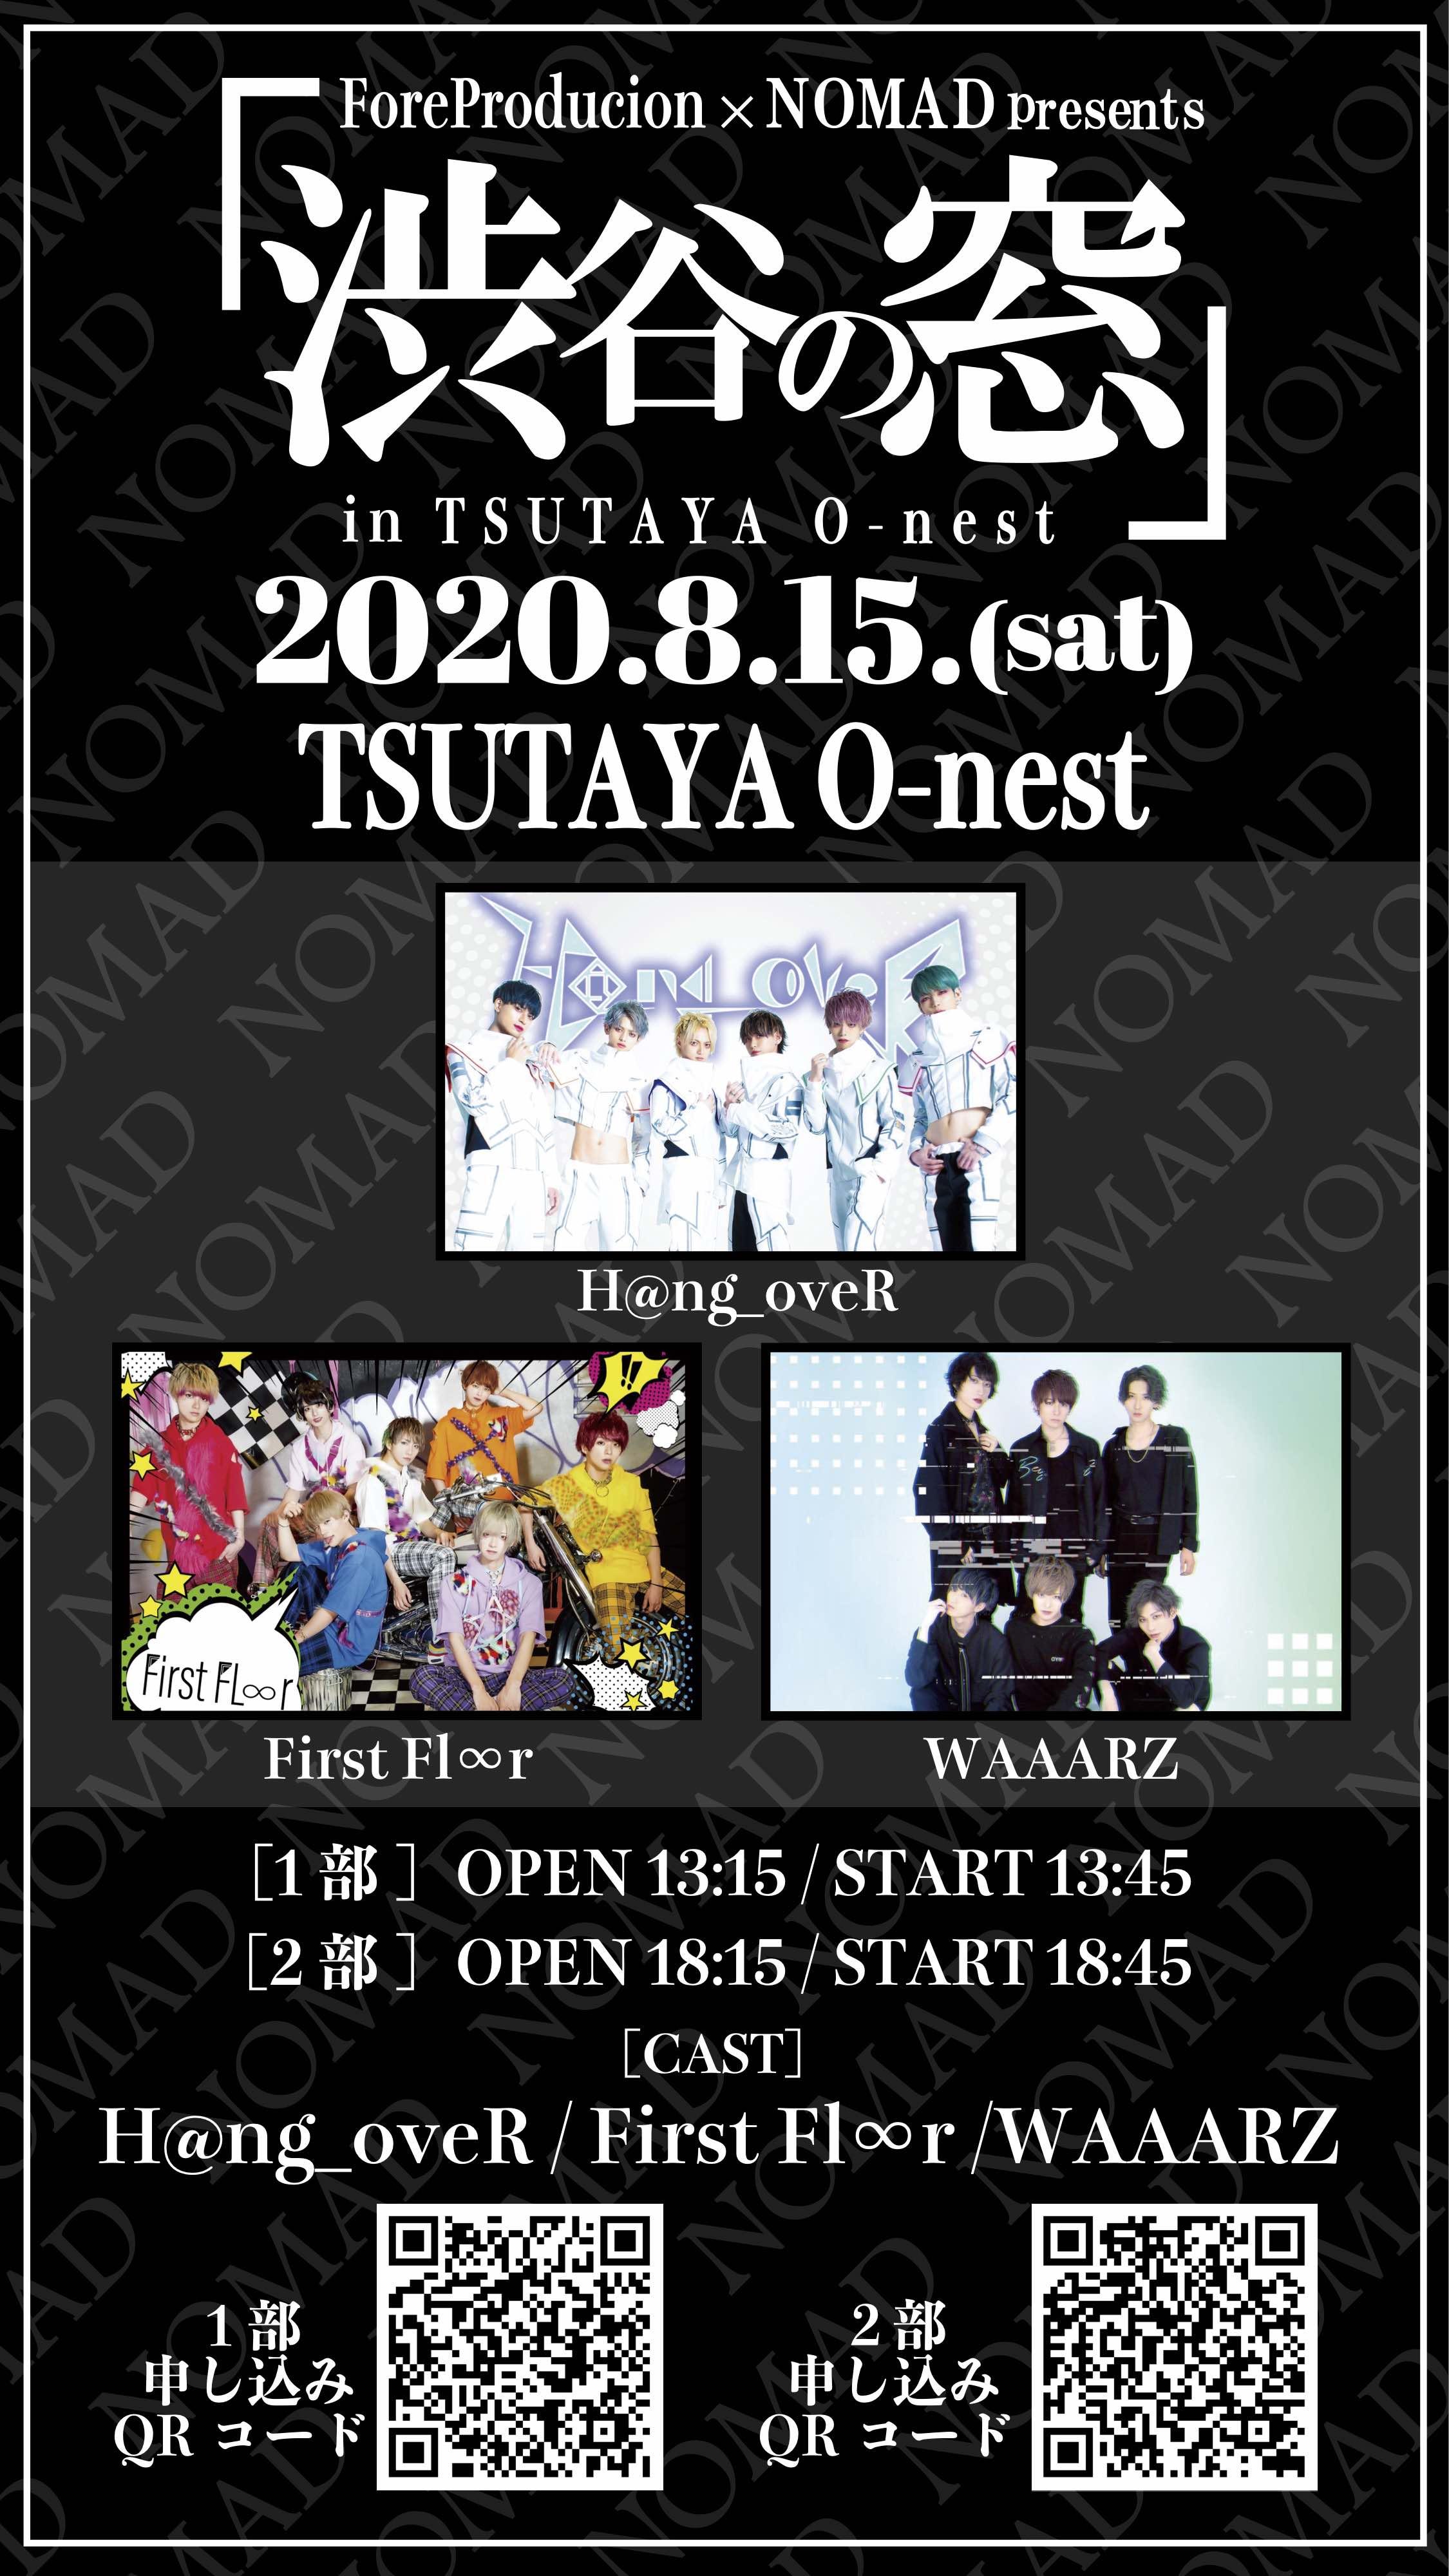 ForeProducion × NOMAD presents「渋谷の窓」in TSUTAYA O-nest <2部>